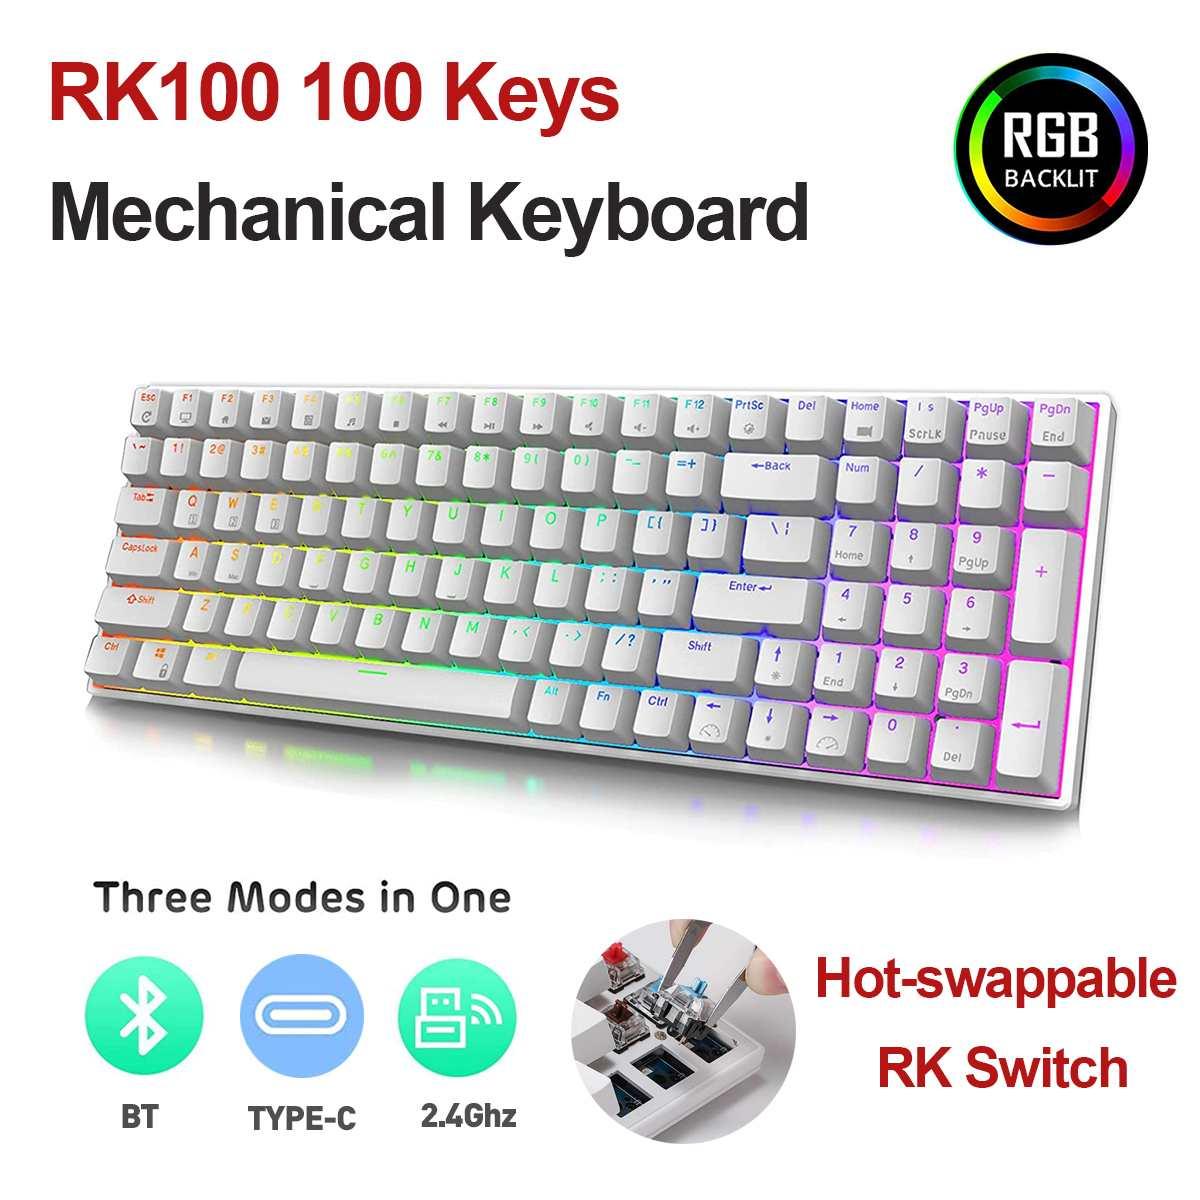 RK84 RK100 84/100 مفاتيح RGB لوحة المفاتيح الميكانيكية الساخن مبادلة RK التبديل اللاسلكية BT5.0 + 2.4Ghz + Type-C السلكية لوحات مفاتيح الألعاب الميكانيكية